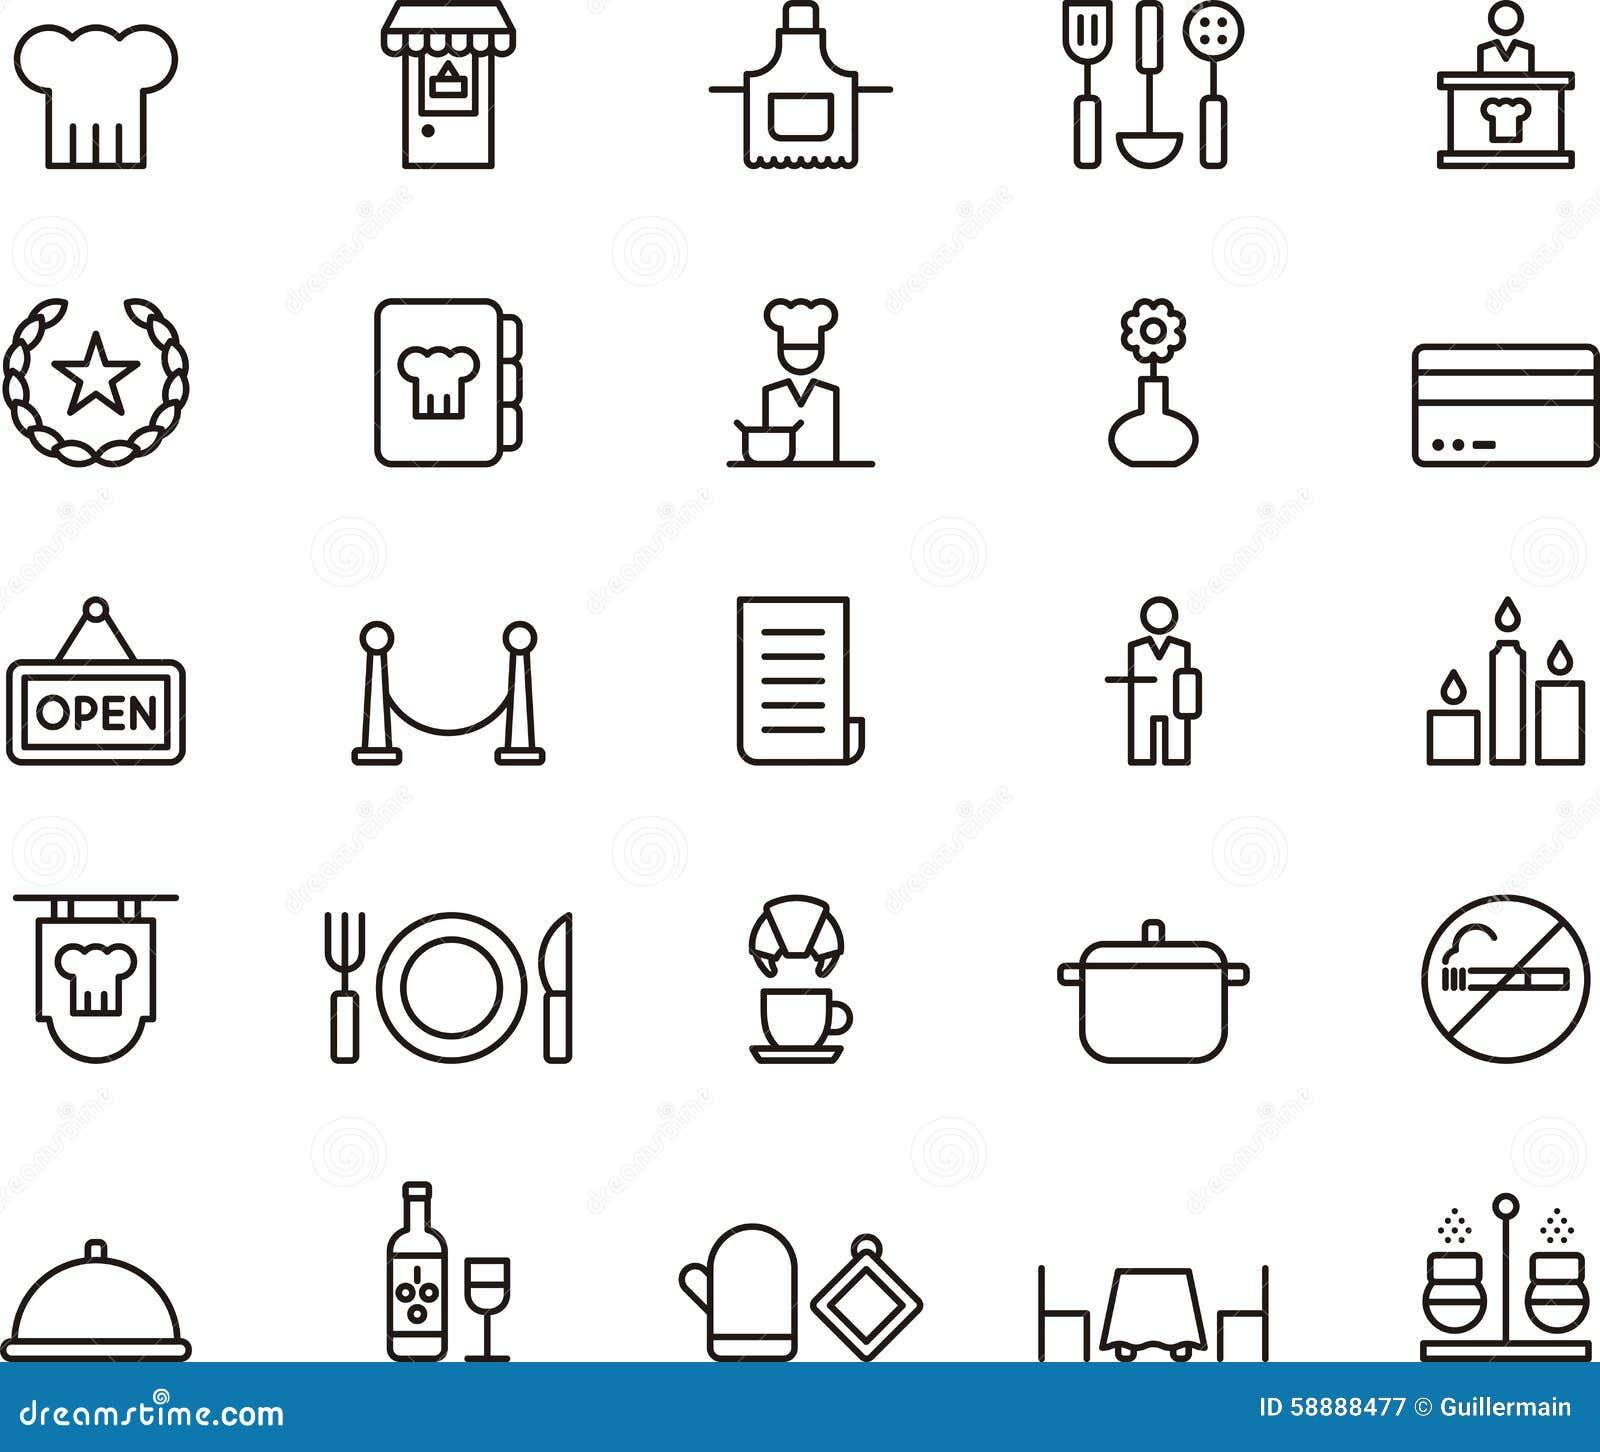 restaurant symbols clip art - photo #41